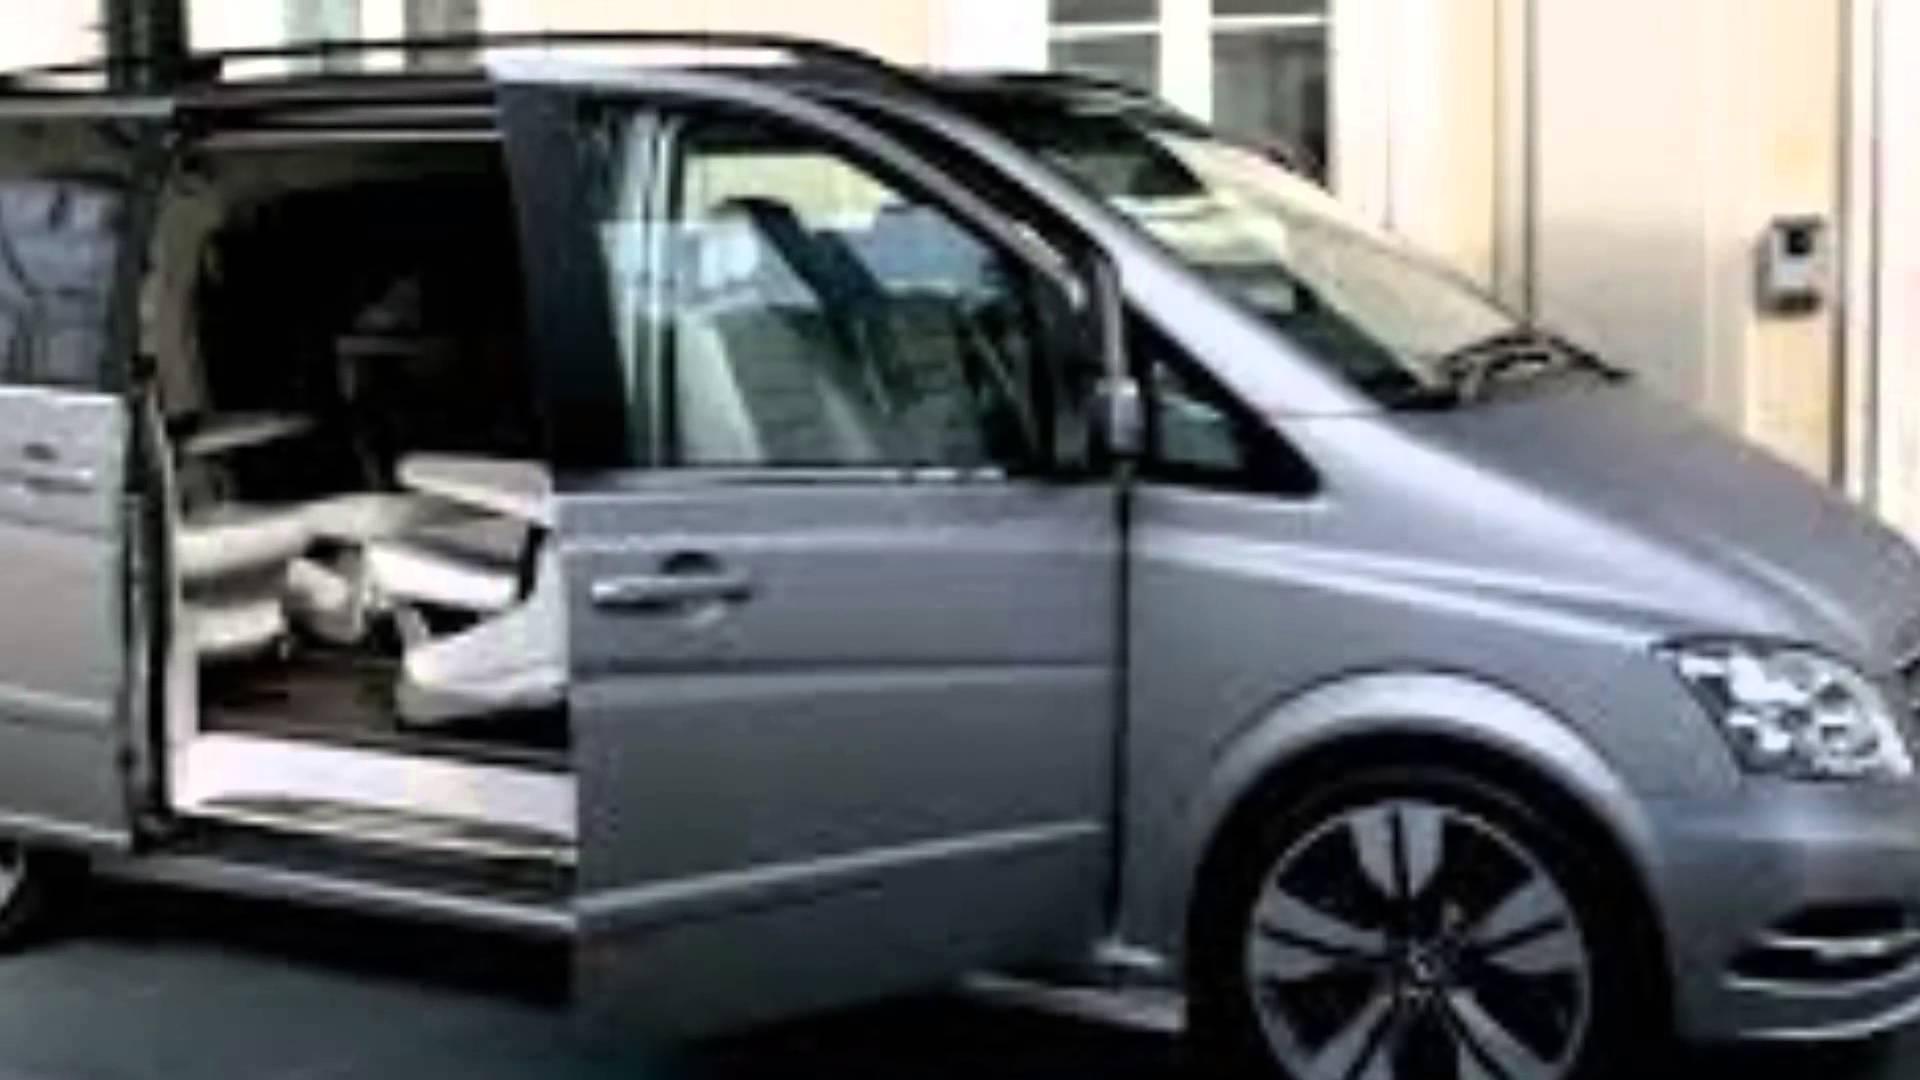 Mercedes-Benz Viano I (W639) Restyling 2010 - 2014 Minivan #5